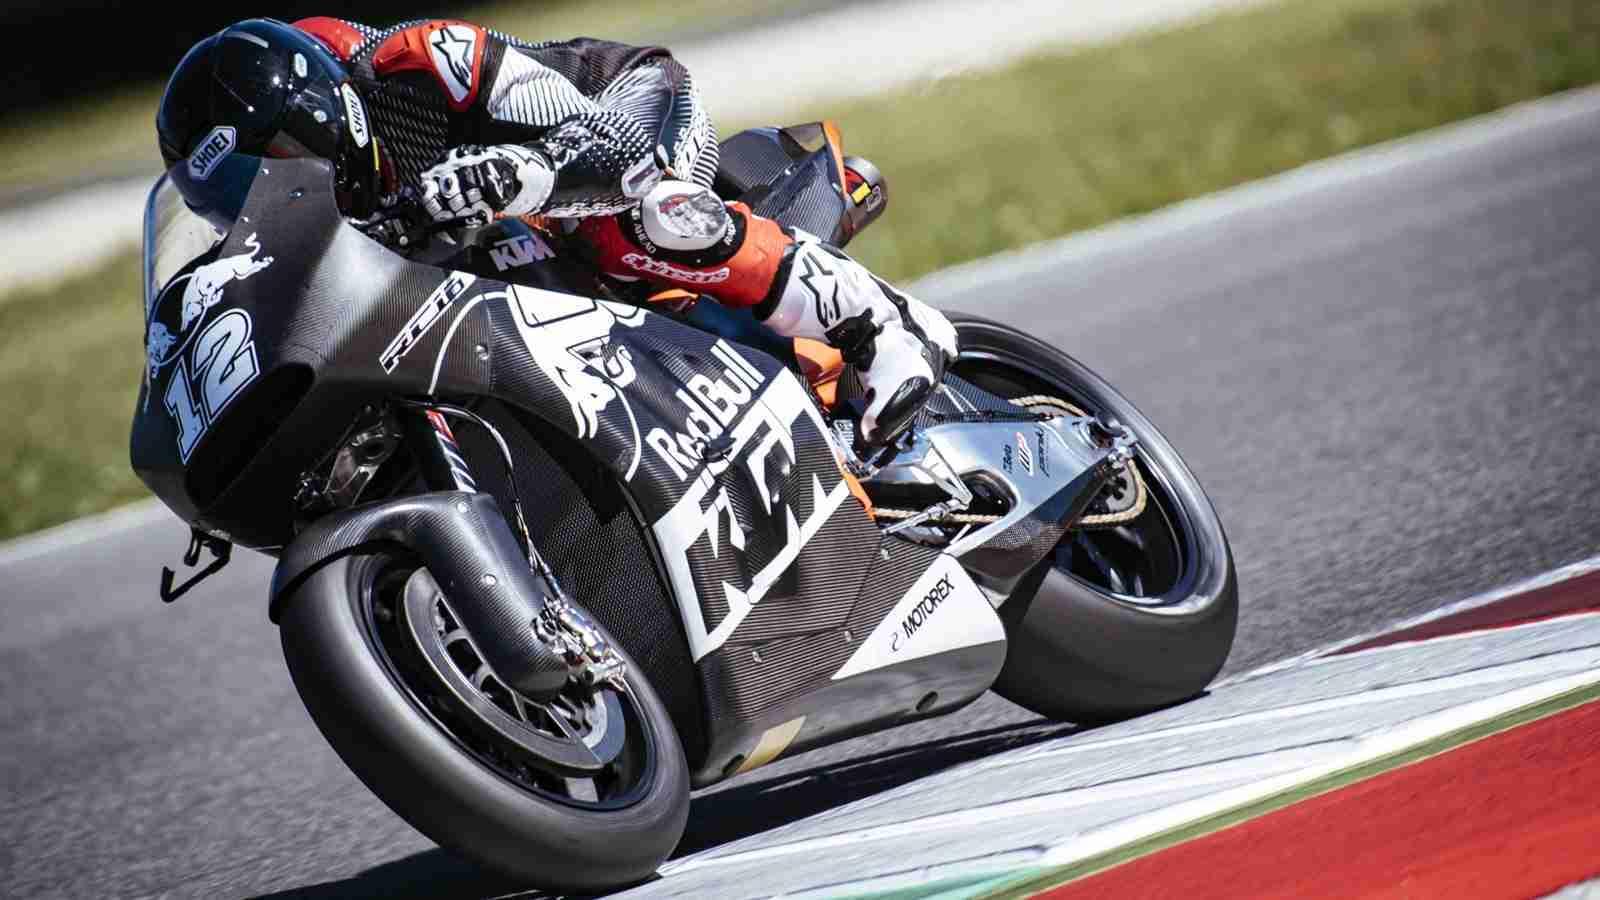 KTM RC16 MotoGP bike almost ready | IAMABIKER